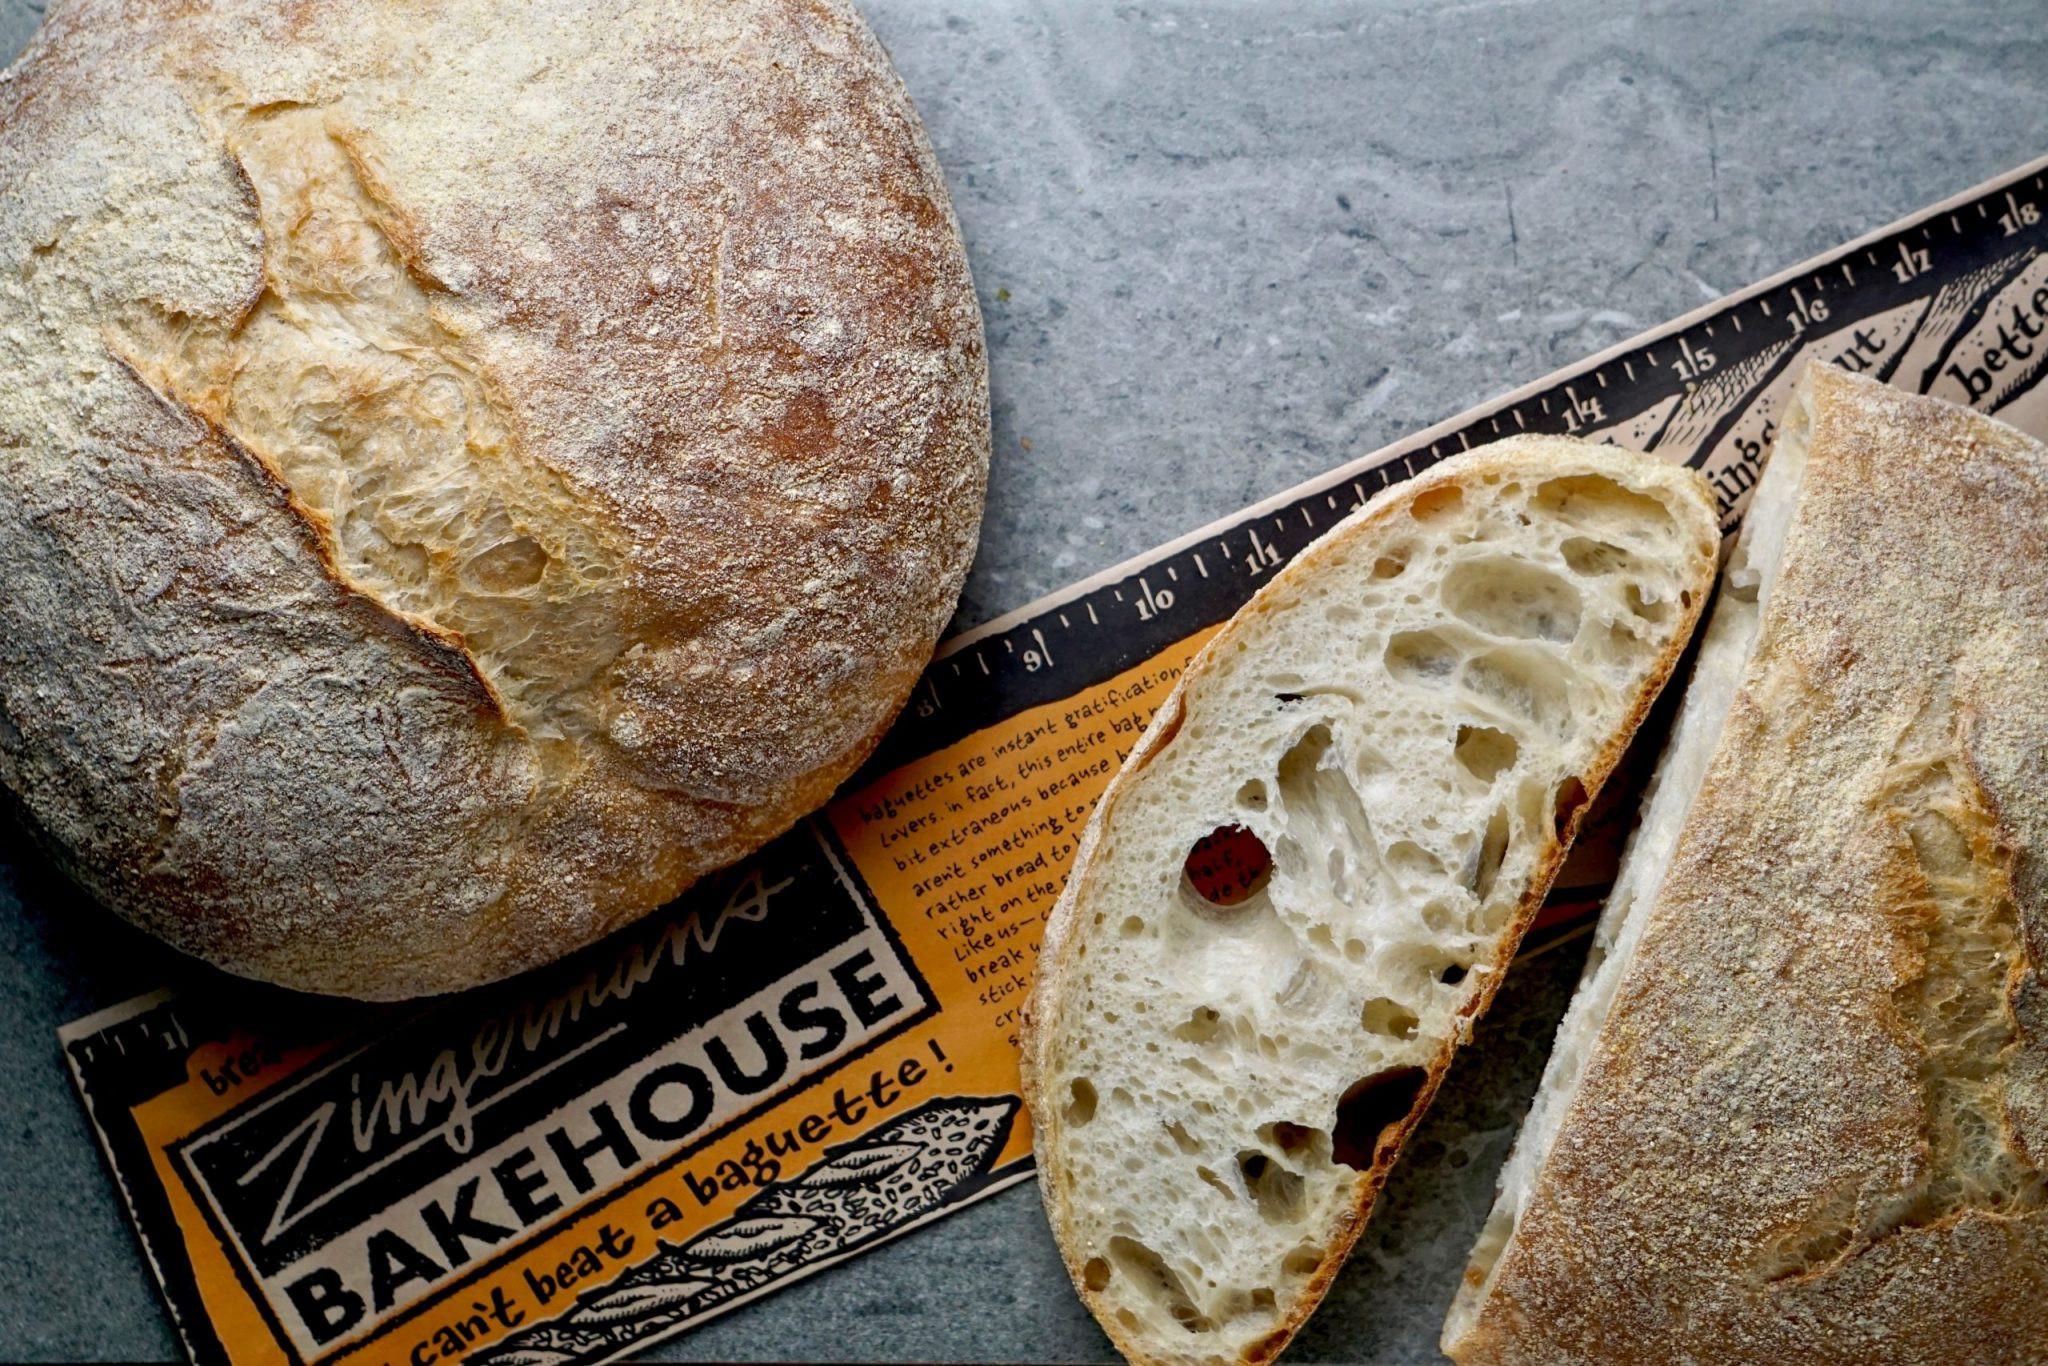 Paesano Bread, Sliced